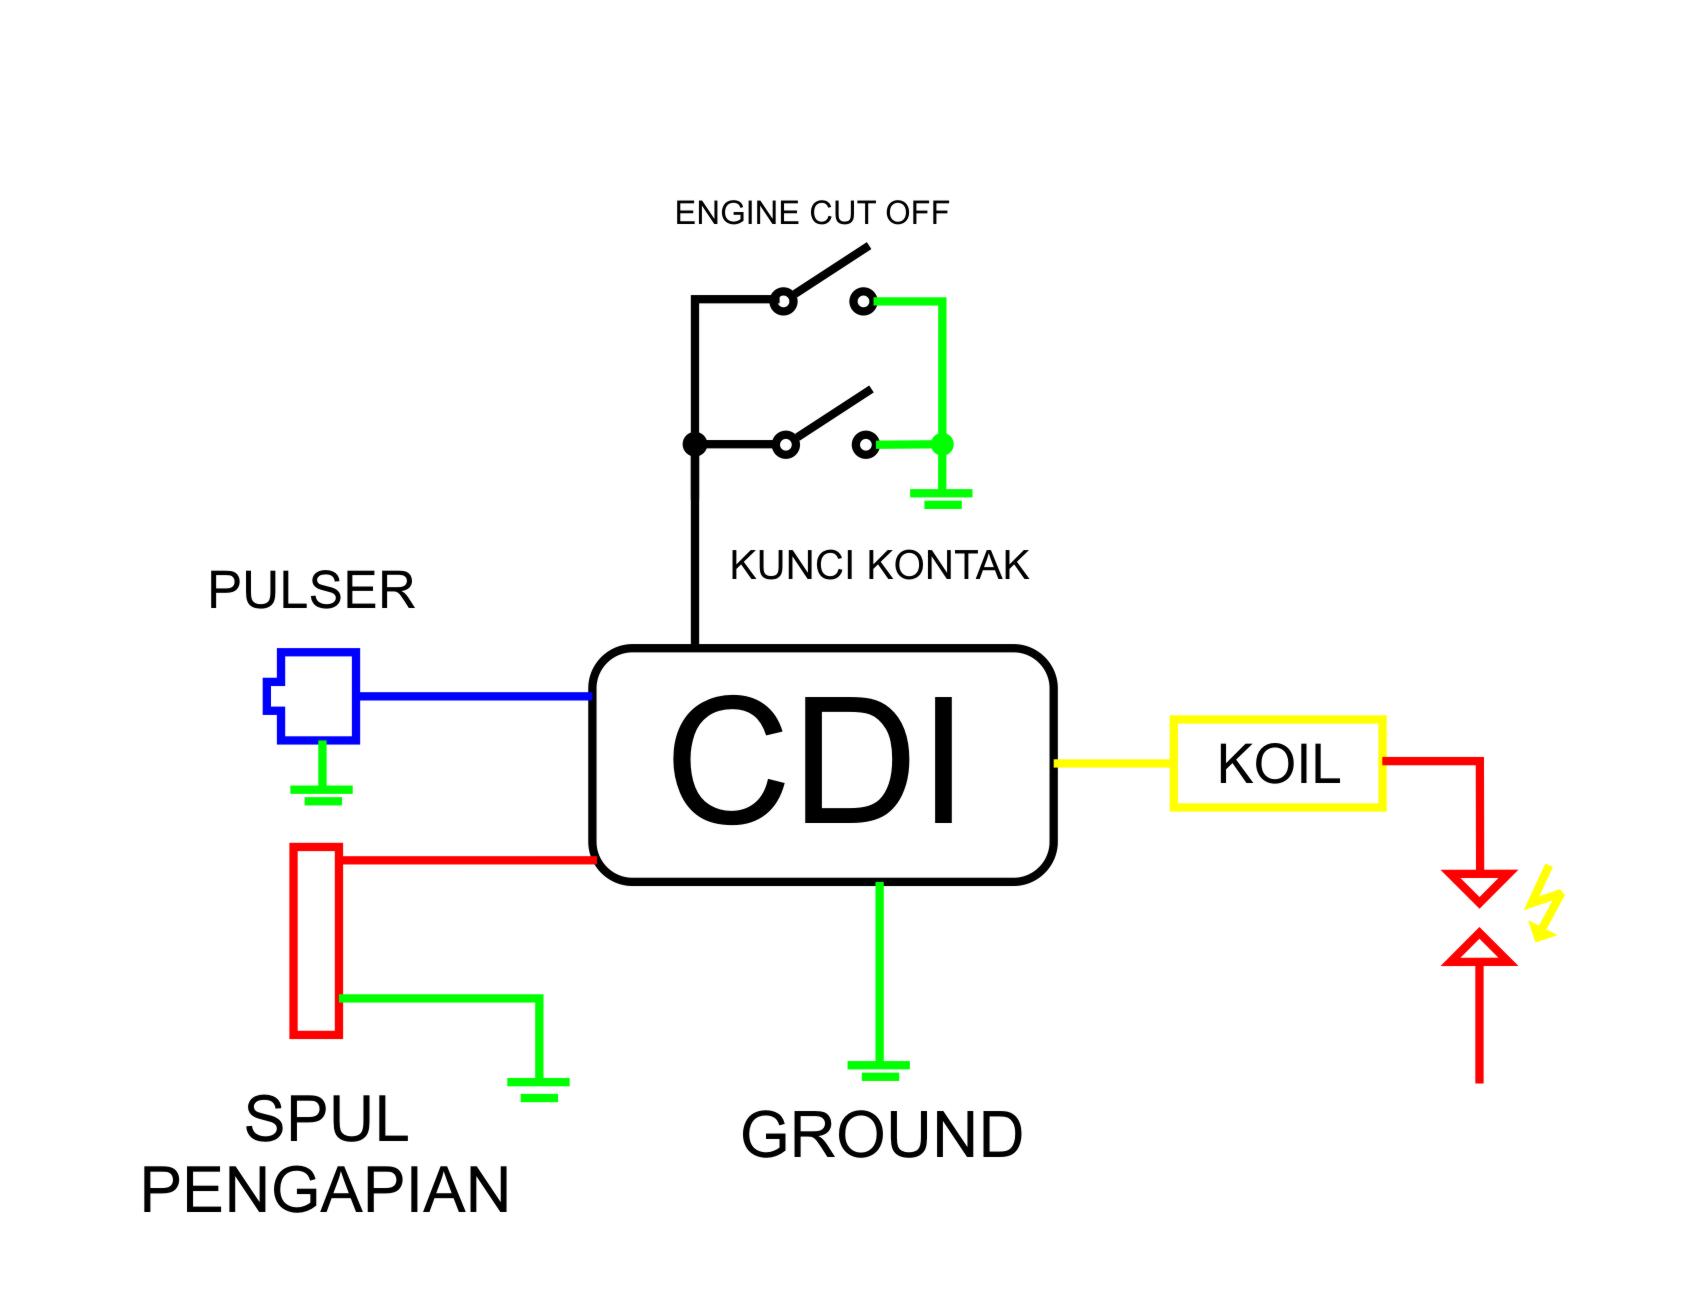 Marvelous Wiring Diagram Motor Bolak Balik Auto Electrical Wiring Diagram Wiring Cloud Overrenstrafr09Org